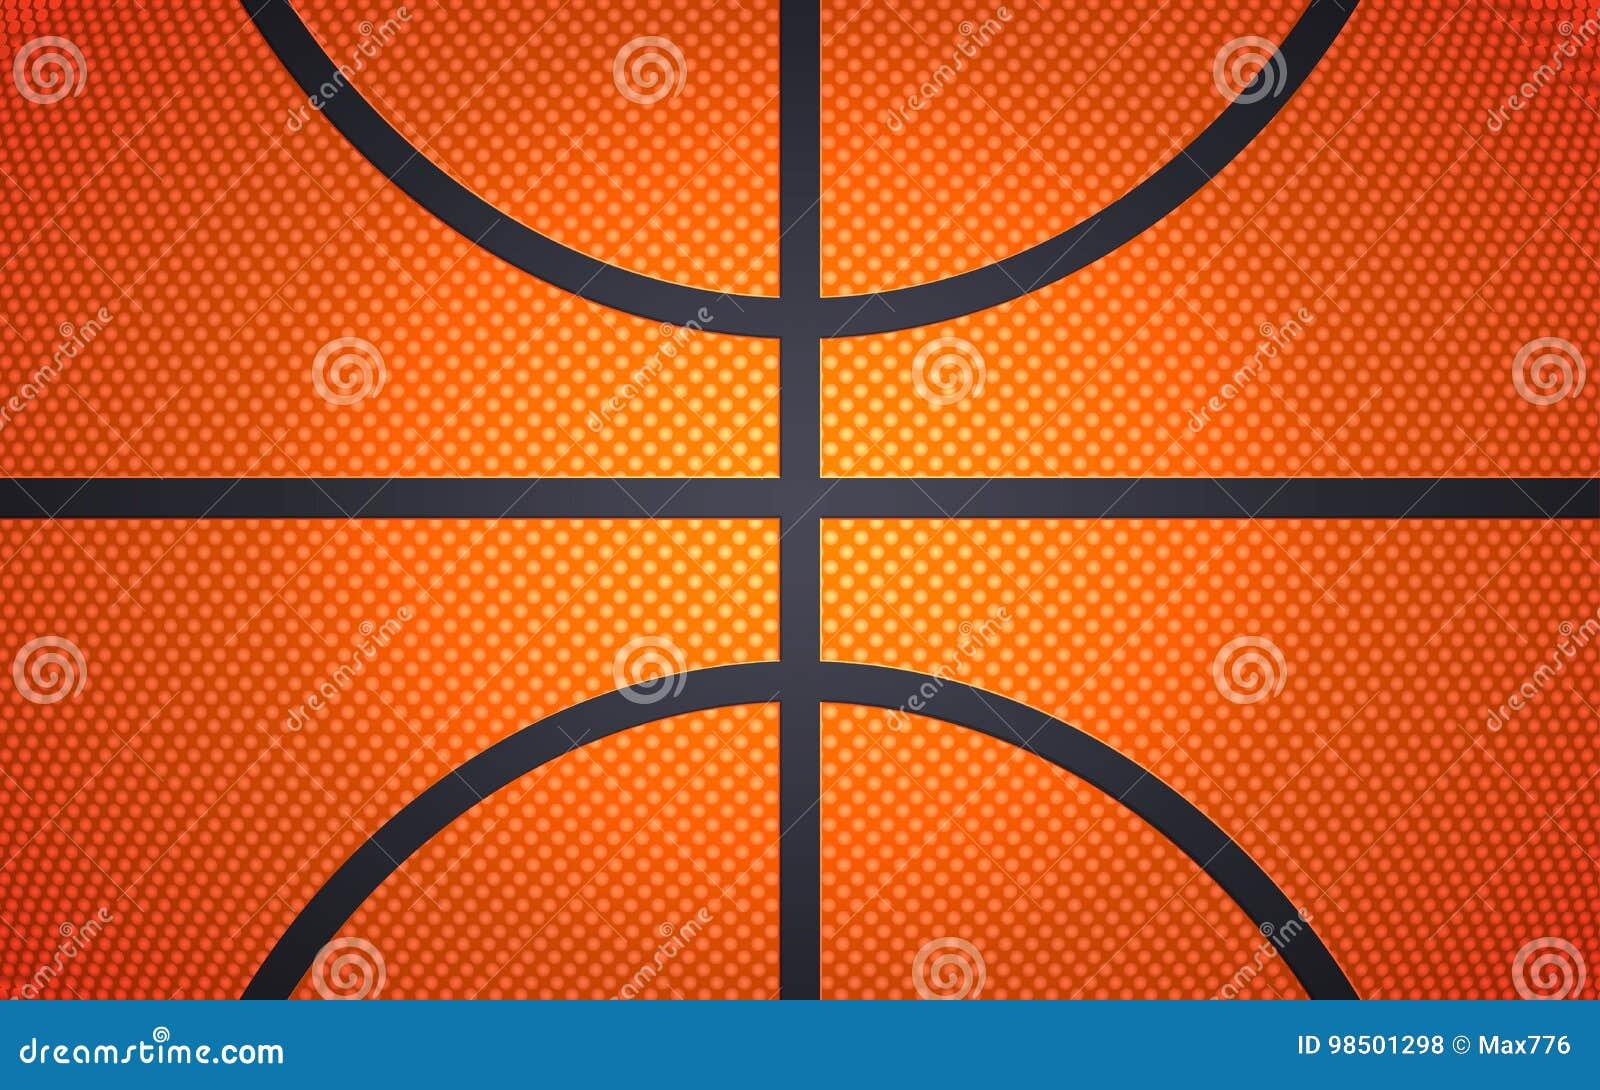 Vertical ball texture for basketball, sport background, vector illustration